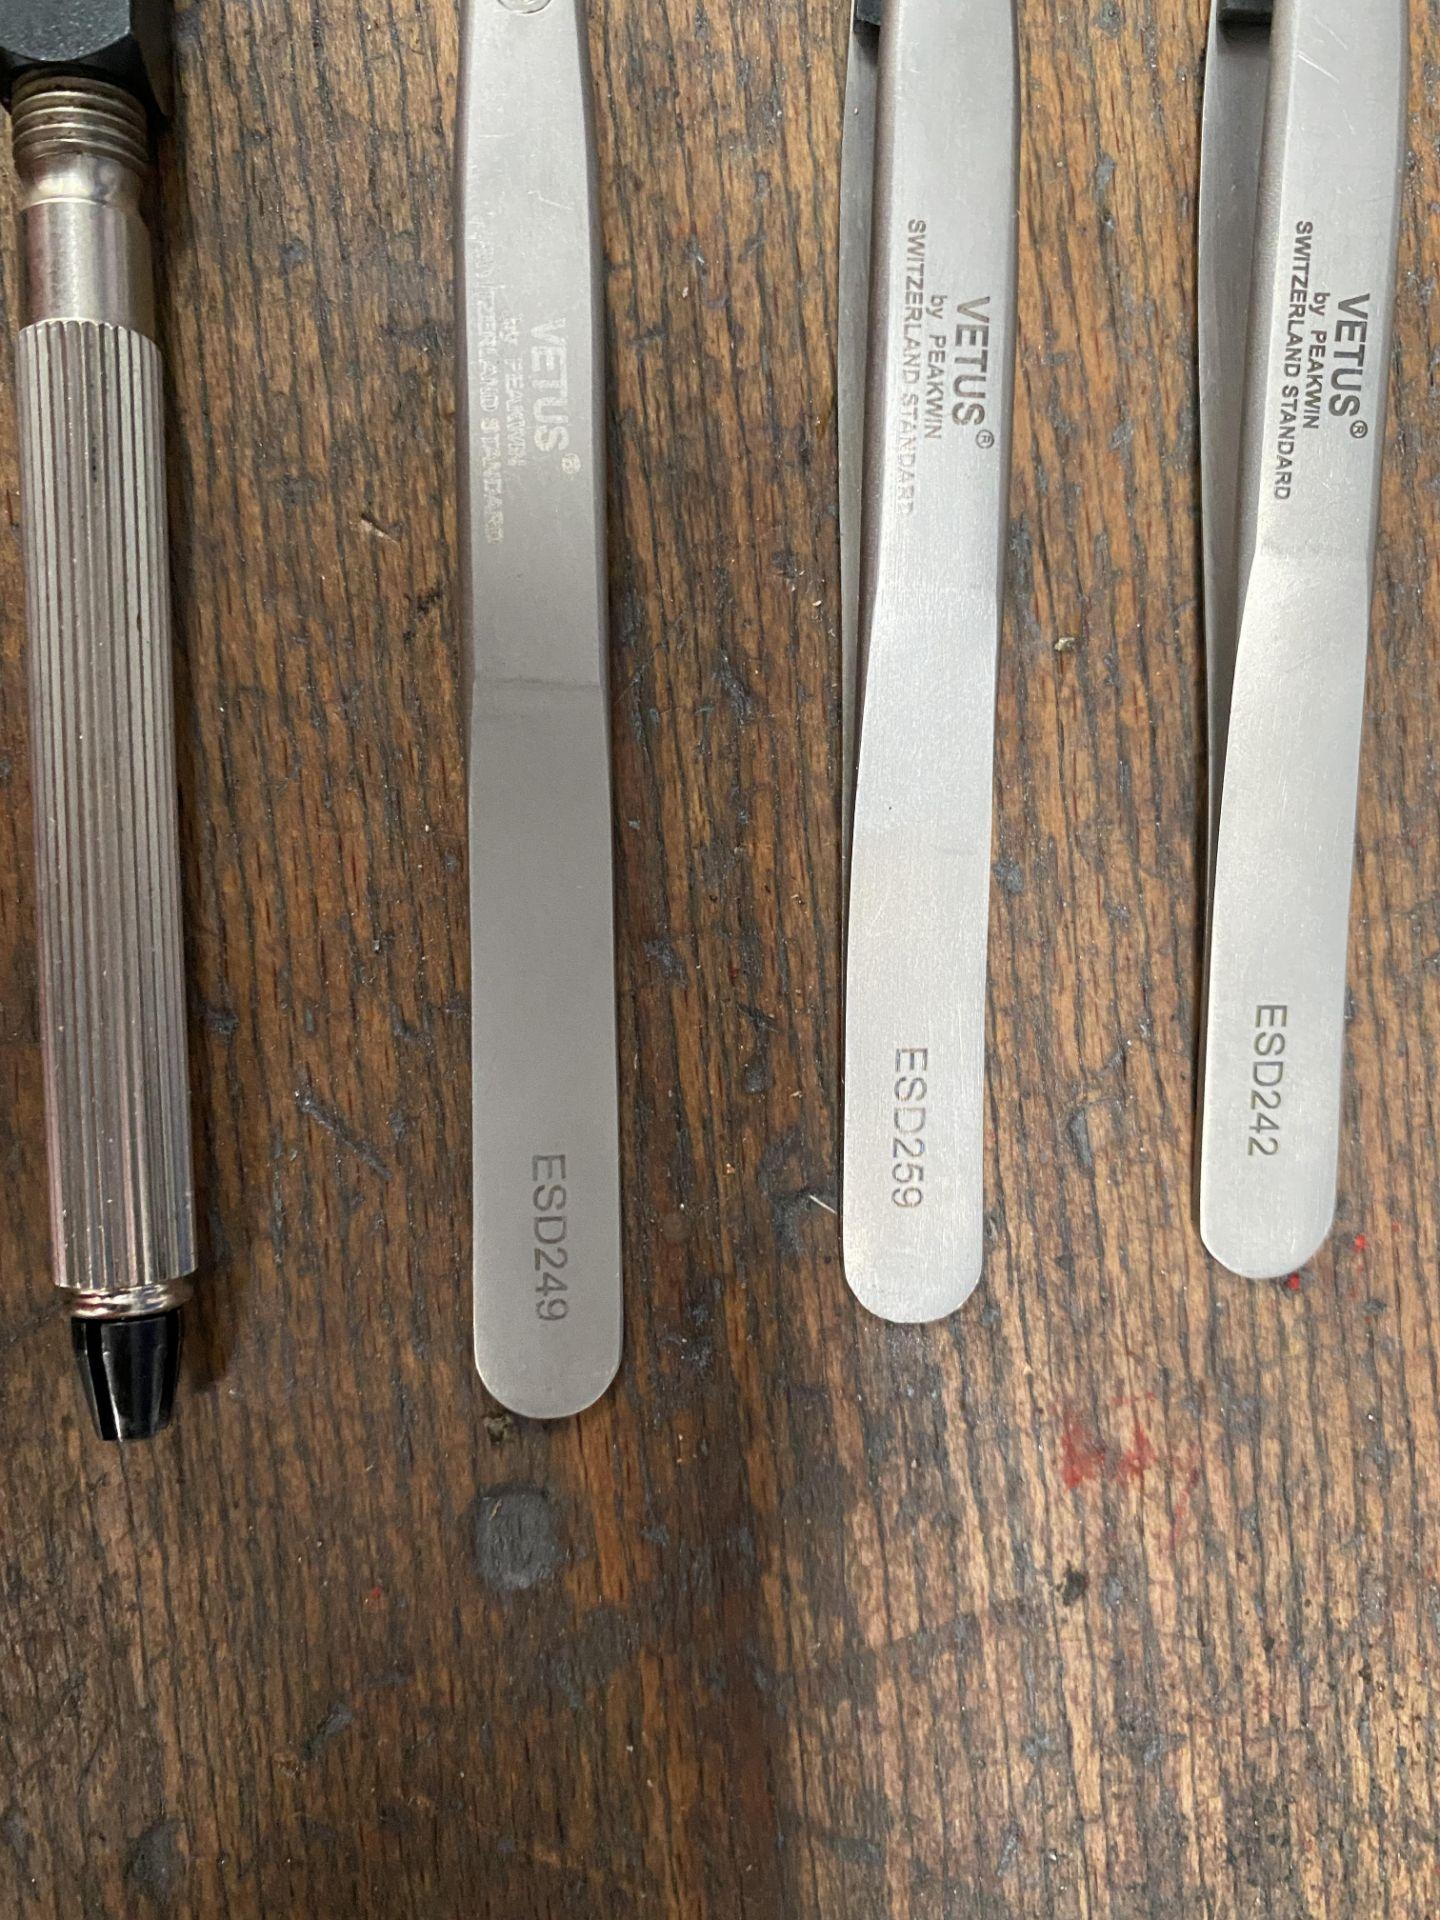 Assorted Vetus Precision Tools & Files - Image 5 of 8